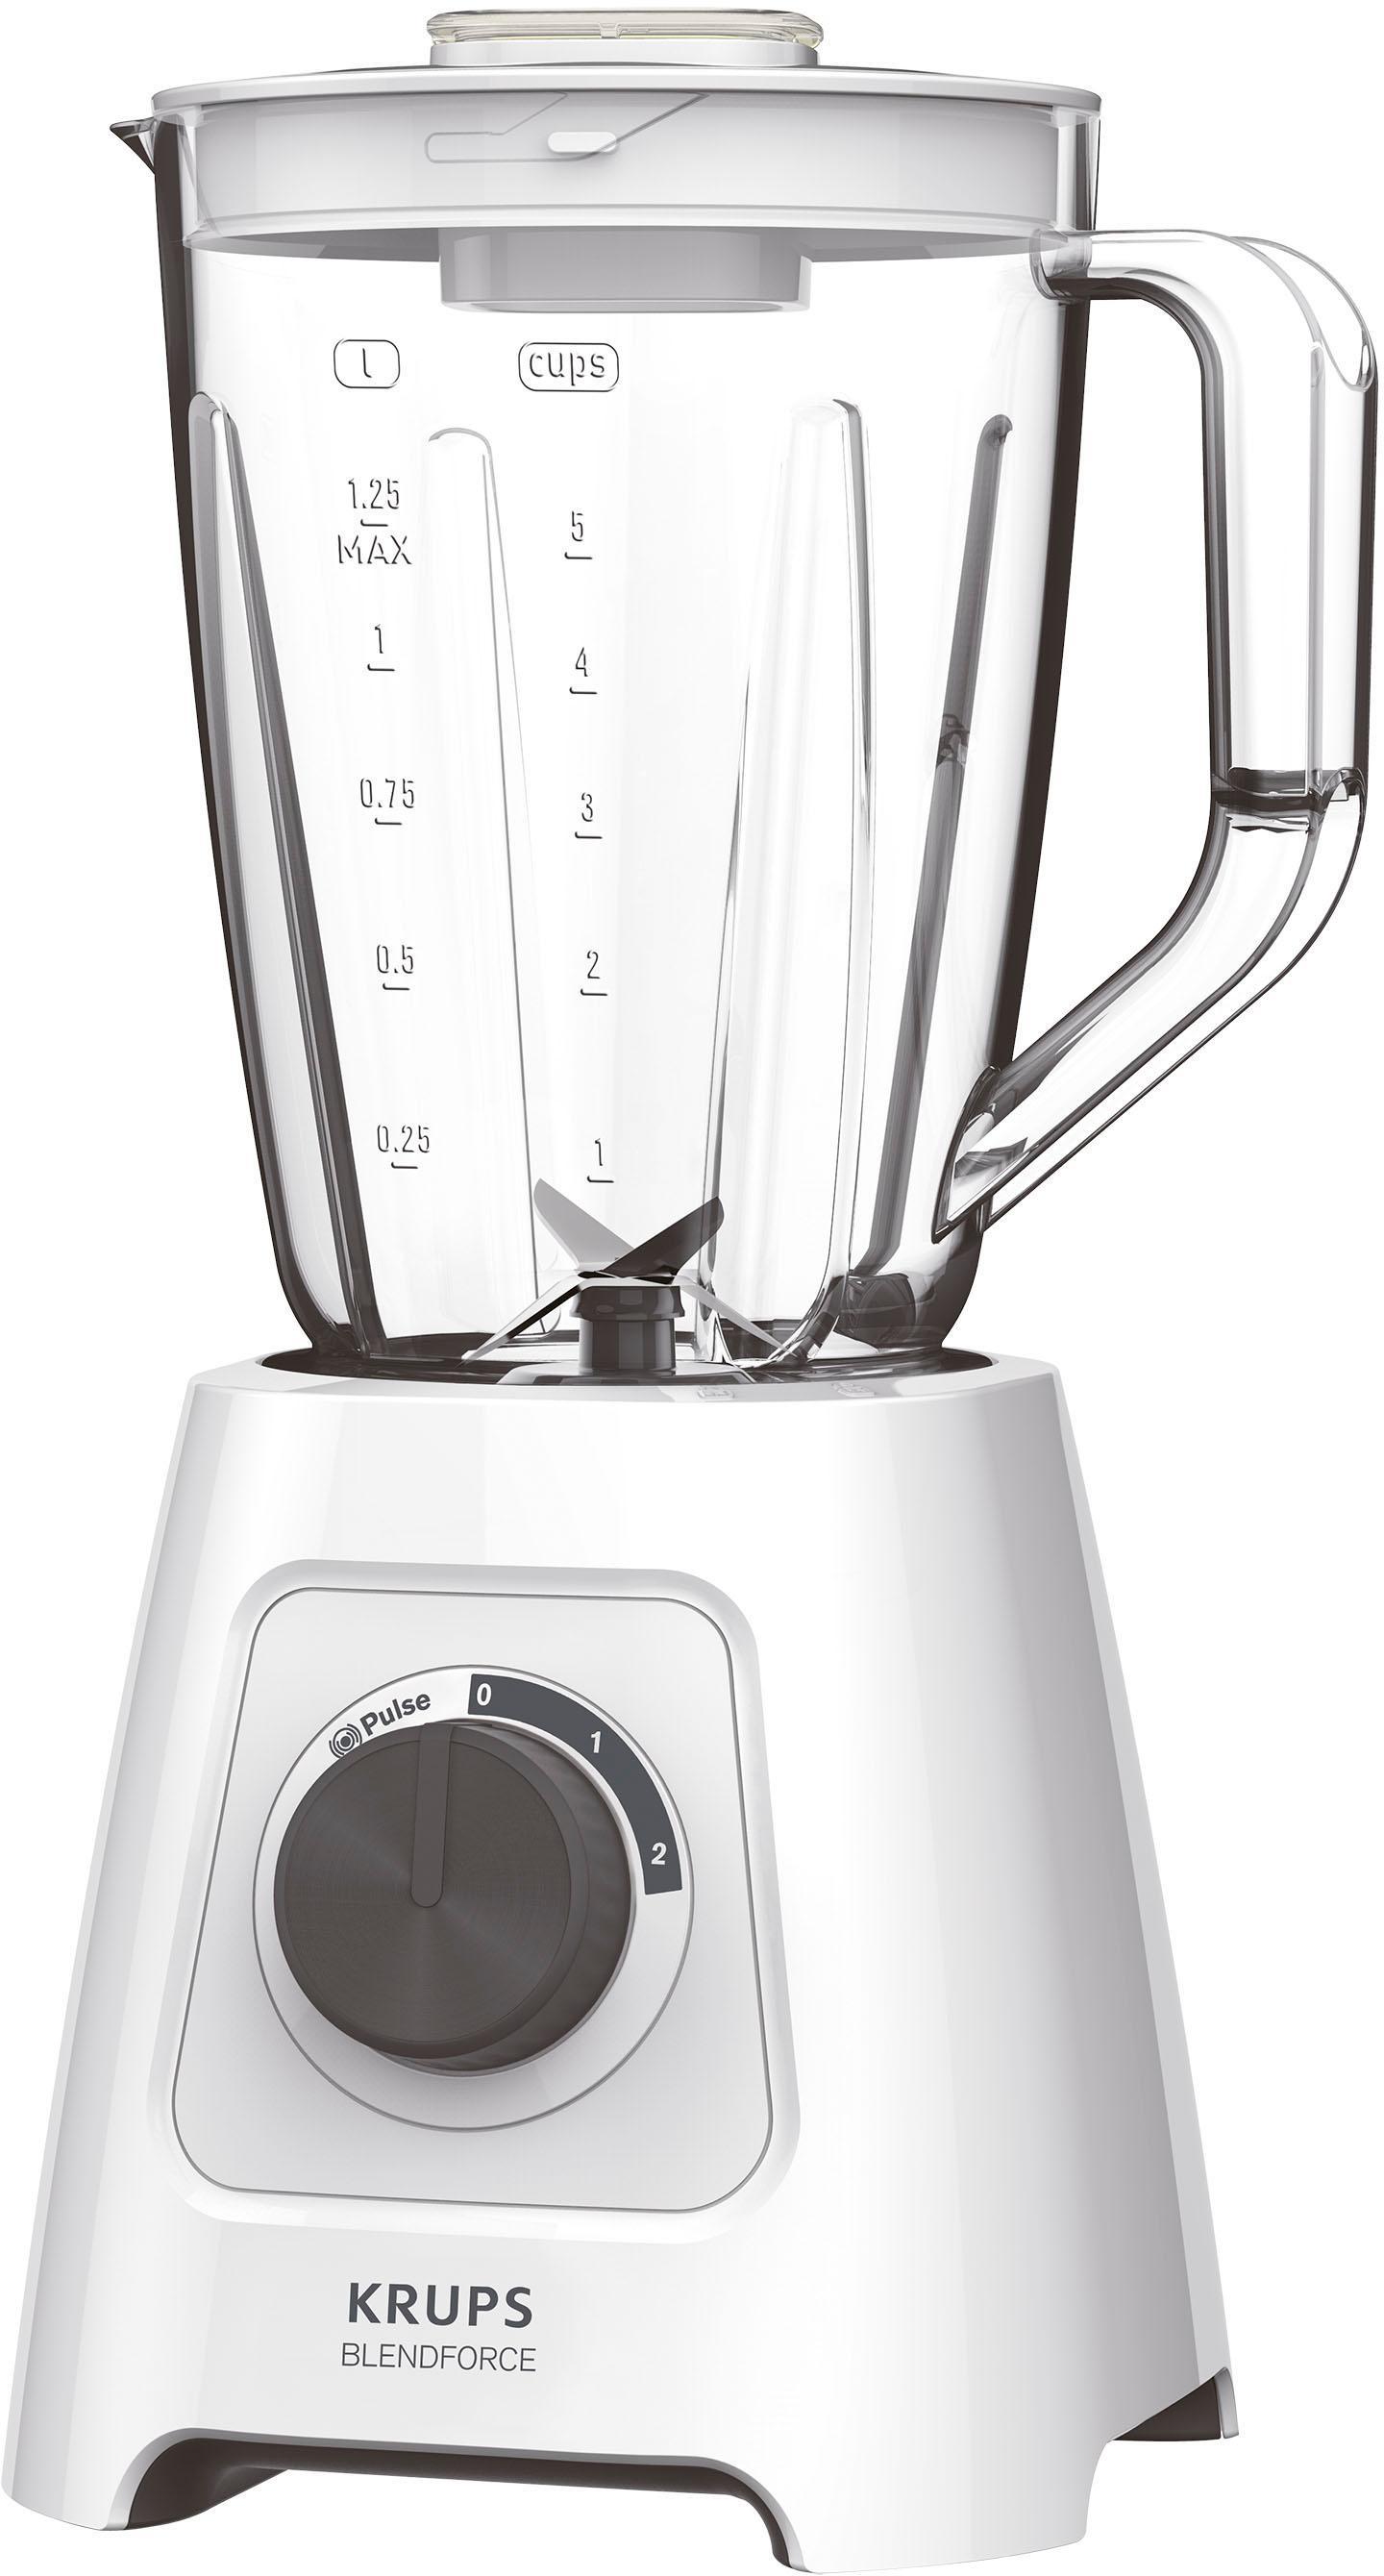 Krups Standmixer KB4201 Blendforce, 600 Watt   Küche und Esszimmer > Küchengeräte > Rührgeräte und Mixer   Krups